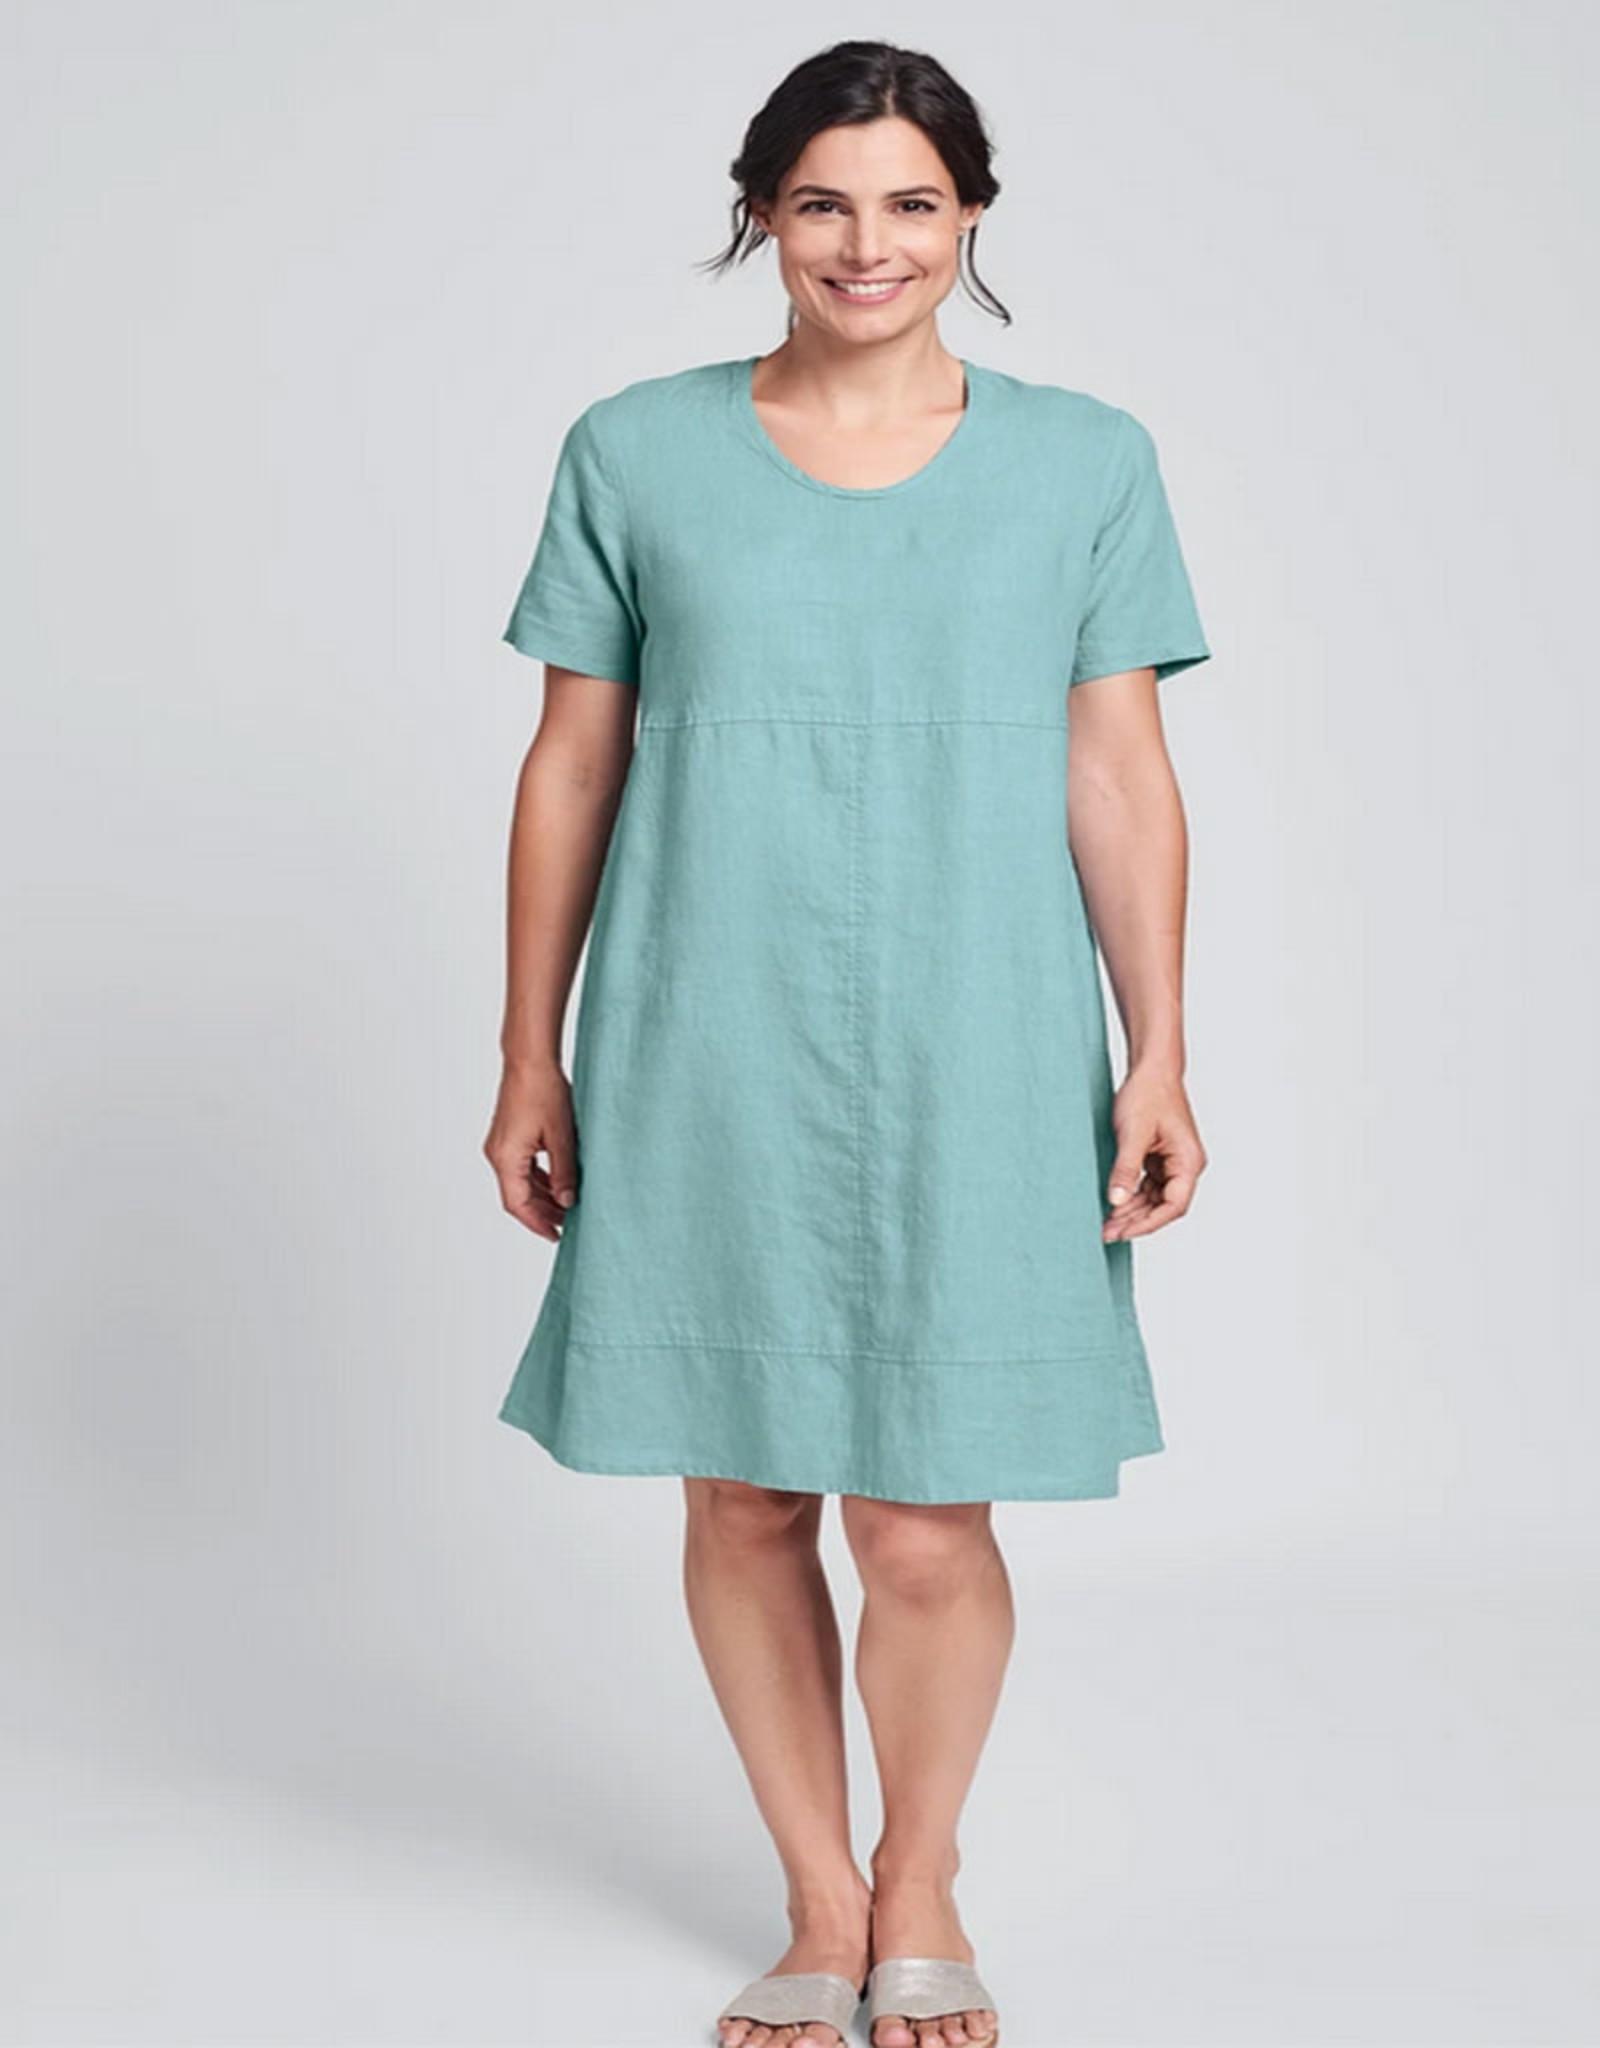 Flax Flax Playdate Dress 2 Colors